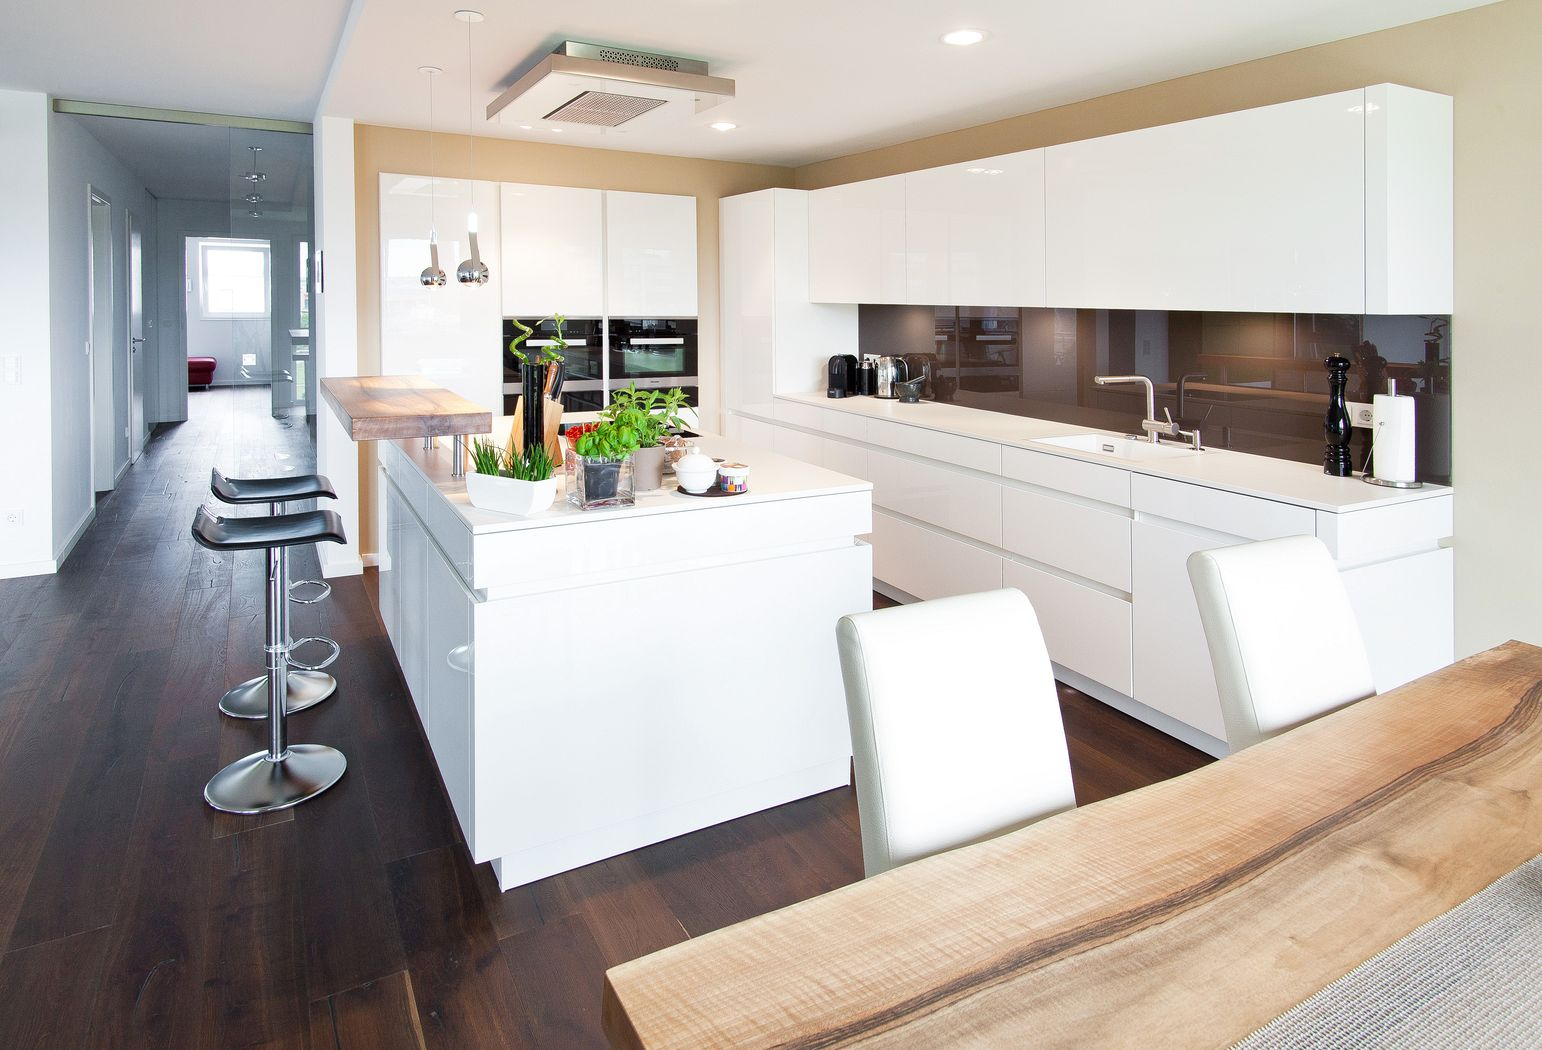 Küche Mit Kochinsel Theke Imposing On Andere überall Kuche 8